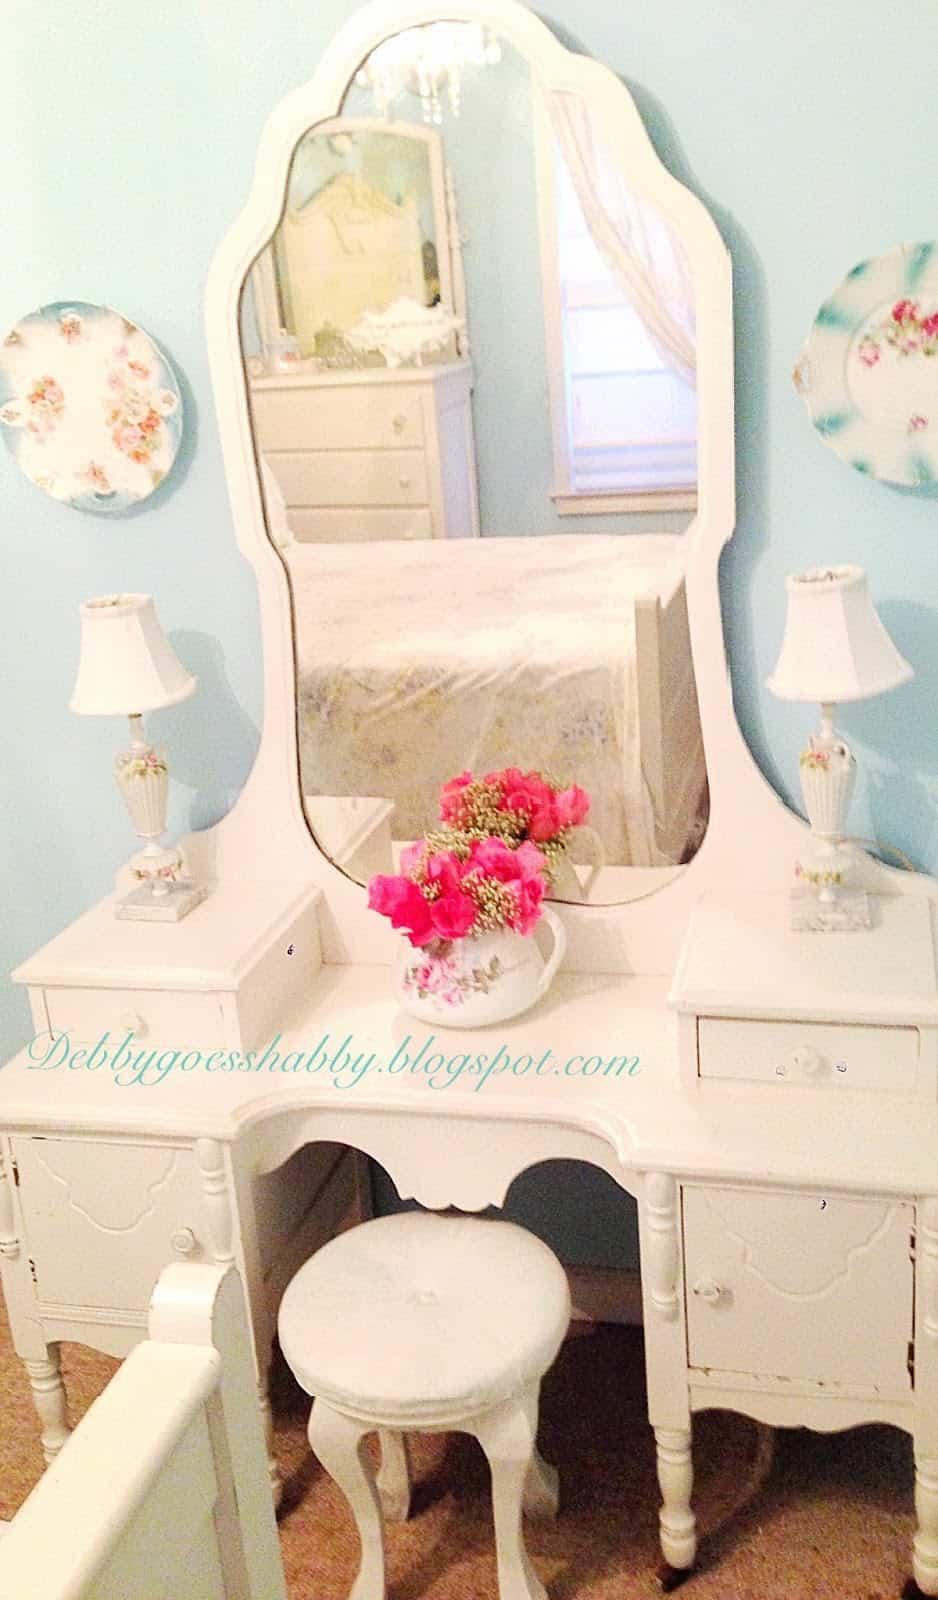 Cinderella Room at Debby Goes Shabby Cecilia 42